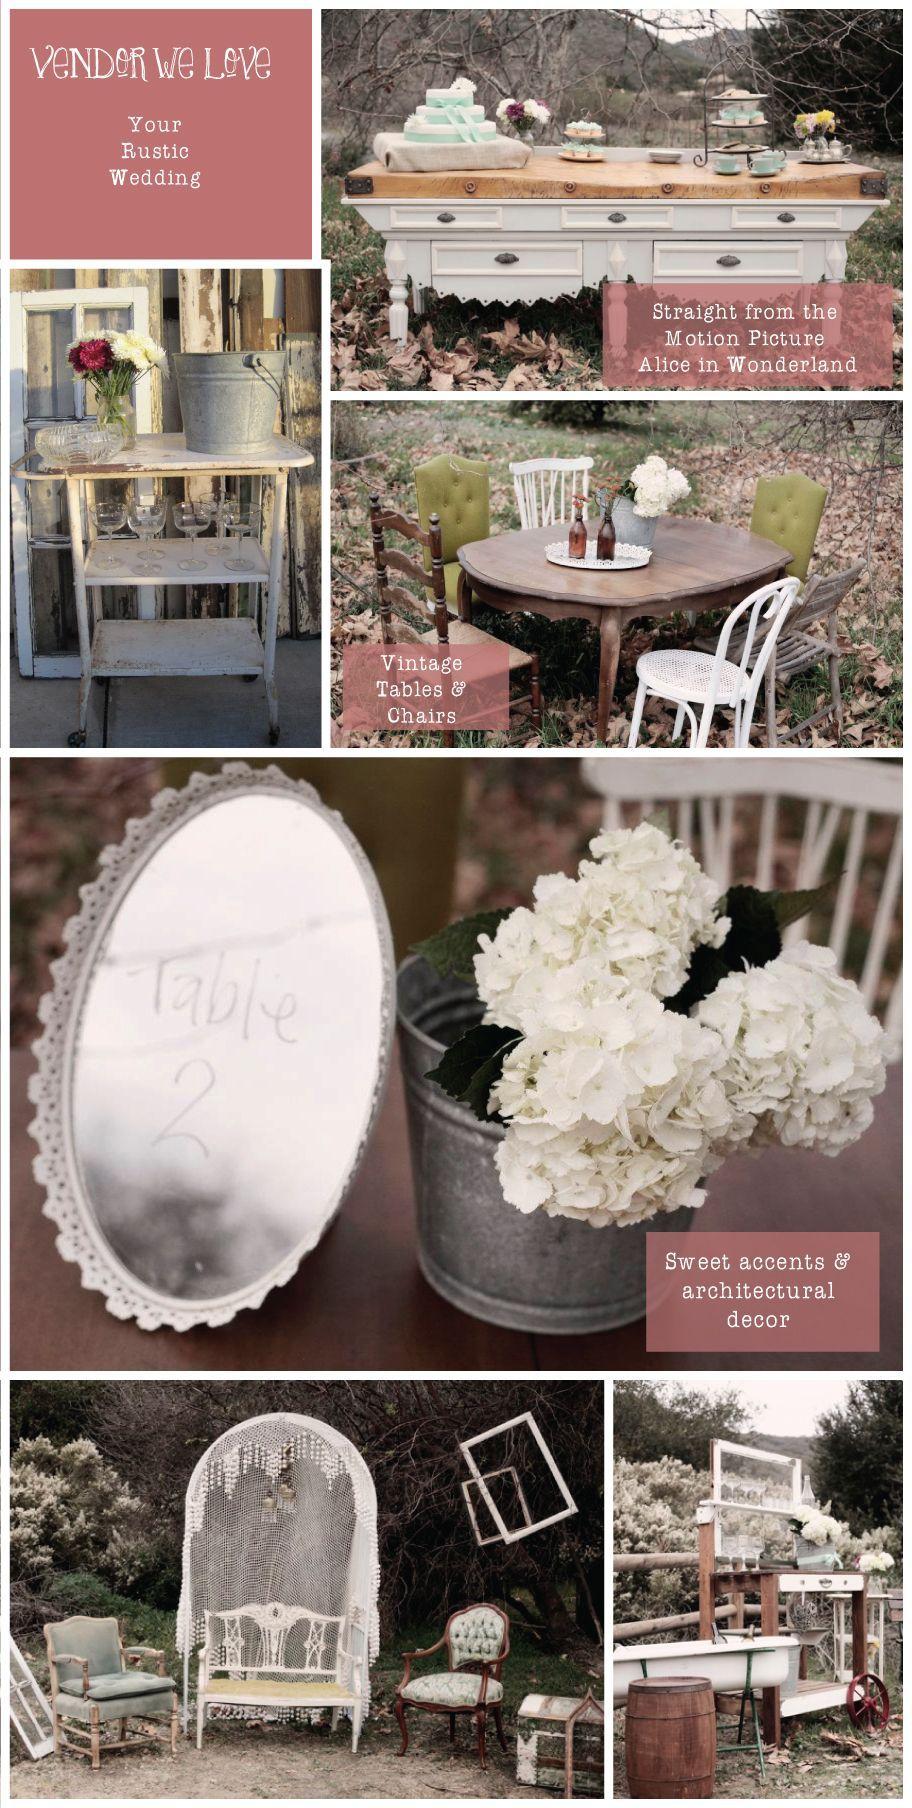 Wedding Decorations Ideas Pinterest Wedding Rentals Decor Vintage Wedding Rentals Wedding Rentals